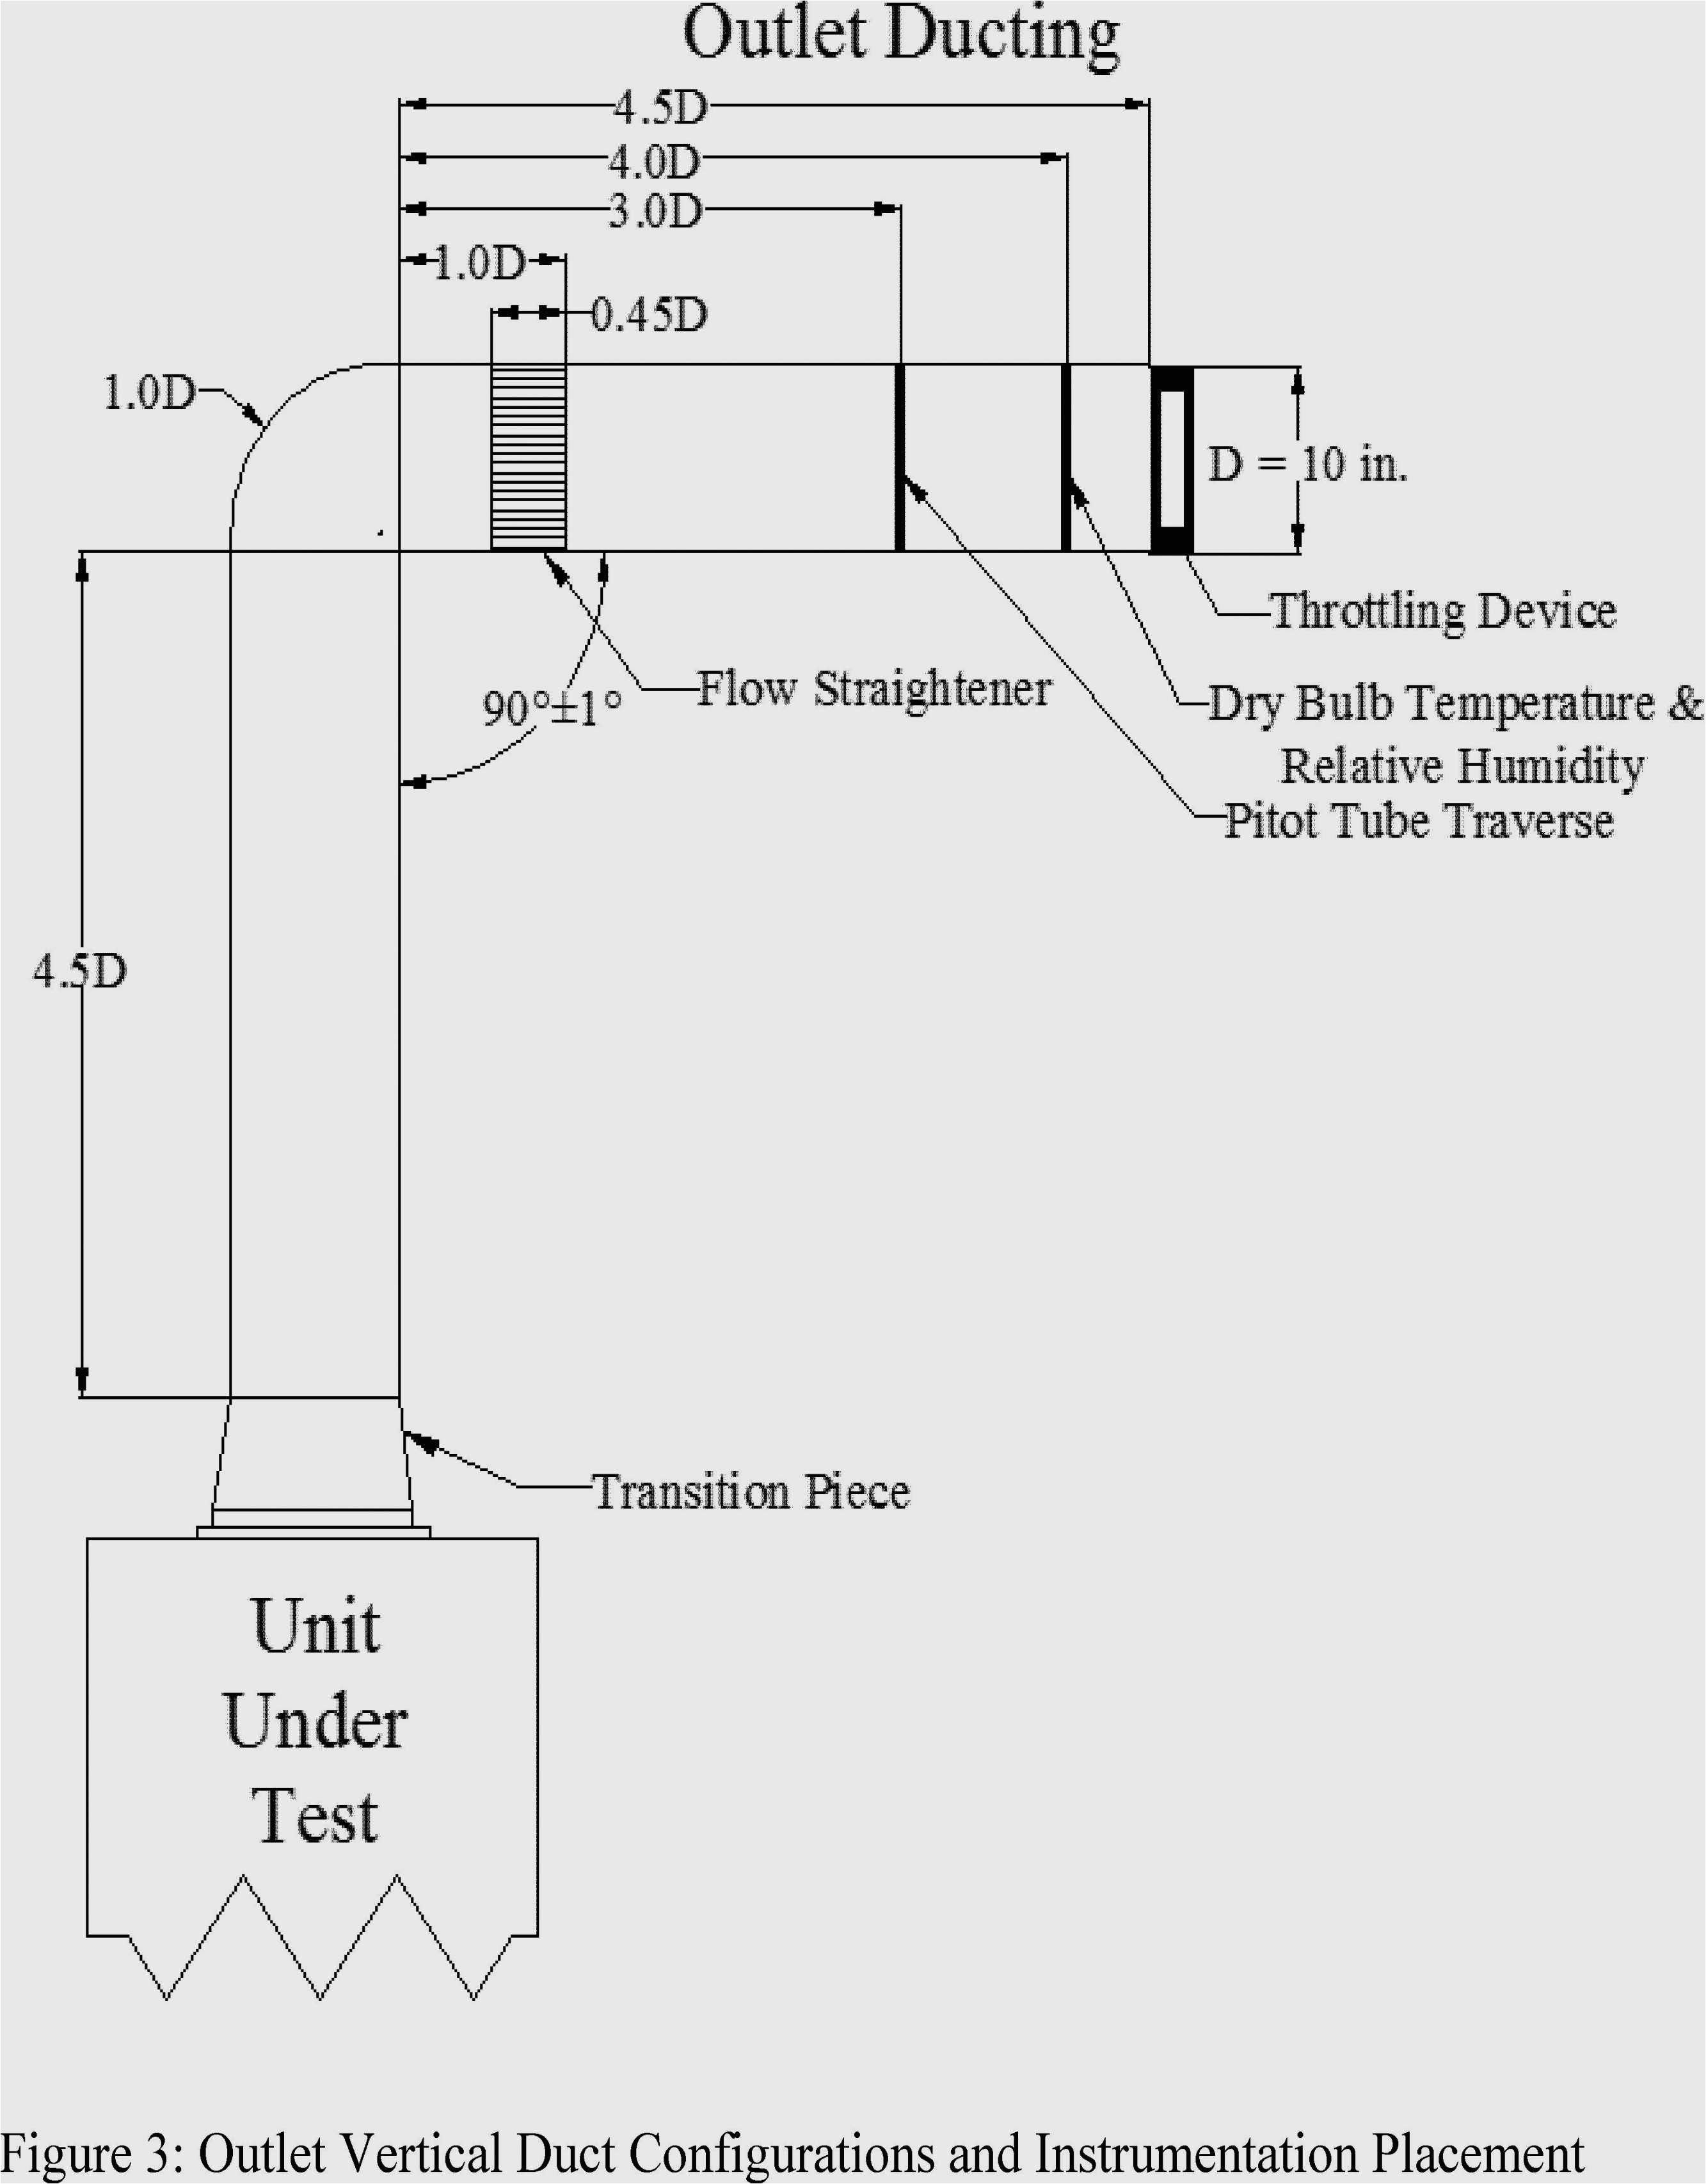 Cat5 Diagram Wiring 10 Cat 5 Cable Splitter Cat 5 Lte Cat 5 Network Ends Cat 5 Switch